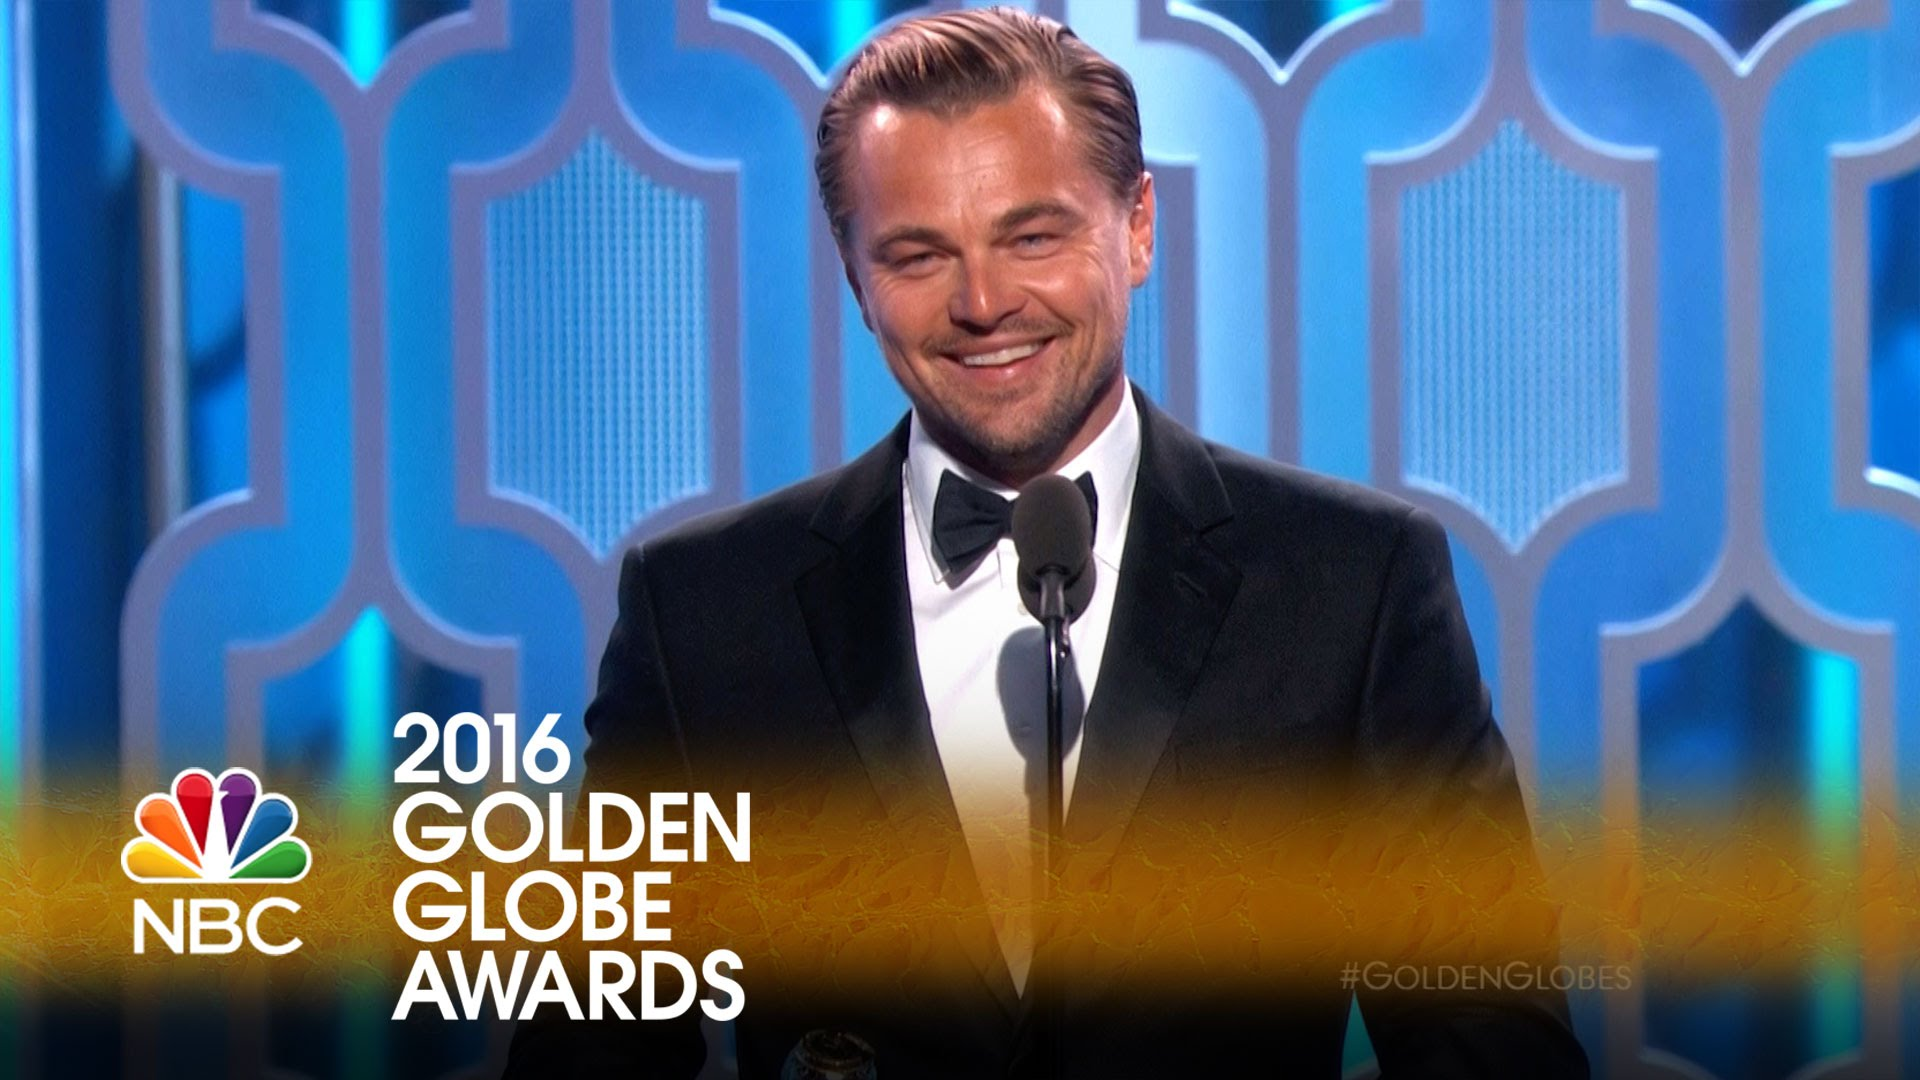 「《神鬼獵人》最大贏家!李奧納多 2016 金球獎得獎感言」- Leonardo DiCaprio Wins Best Actor in a Drama at the 2016 Golden Globes